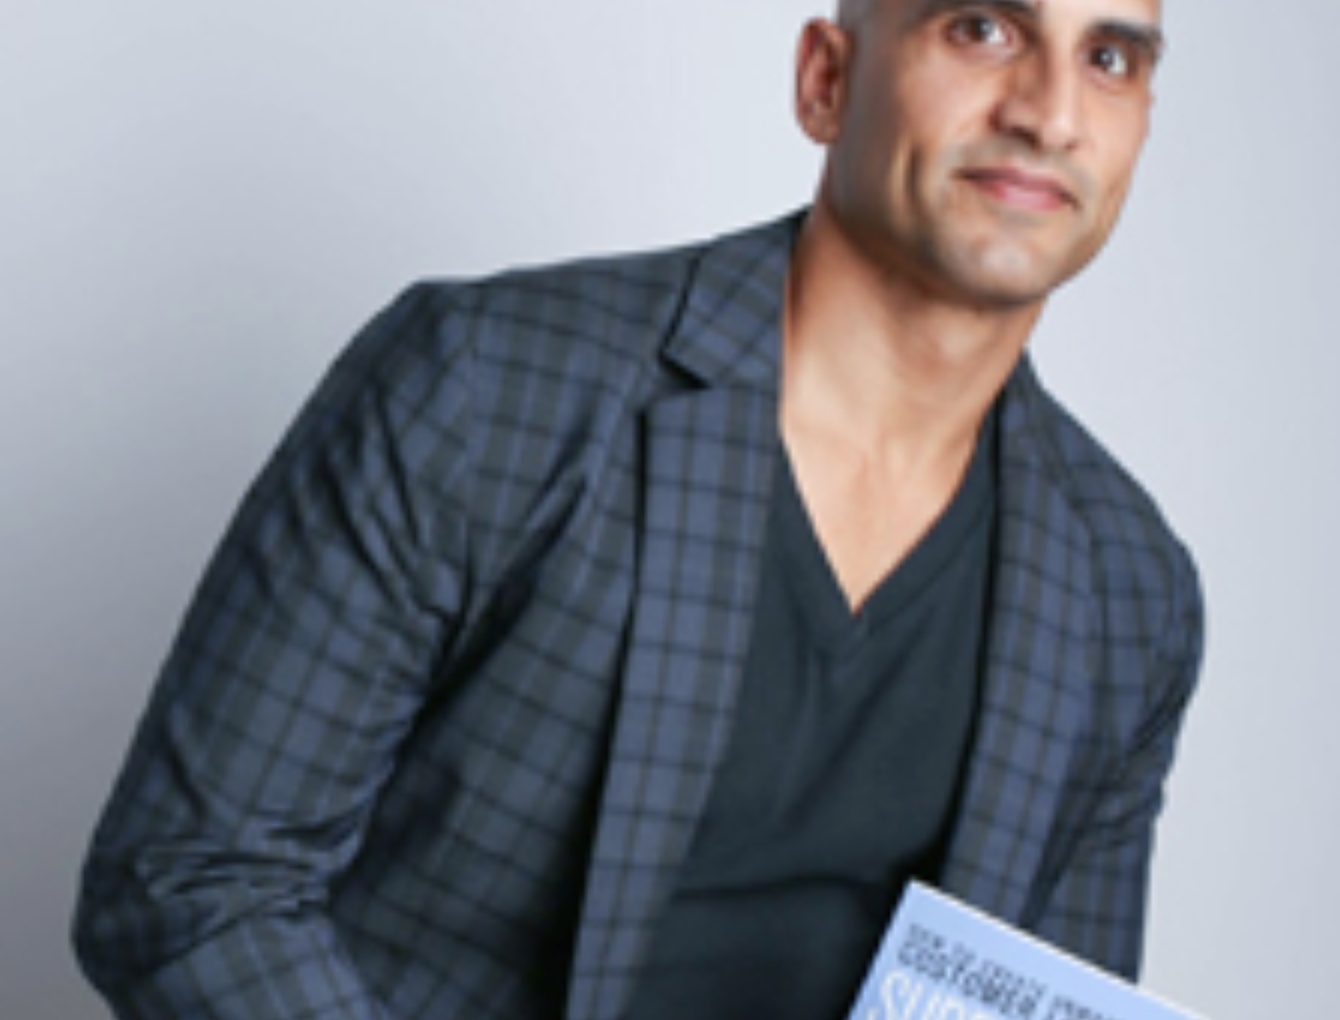 Episode 35 Purdeep Sangha: Superfans and The Male Entrepreneur